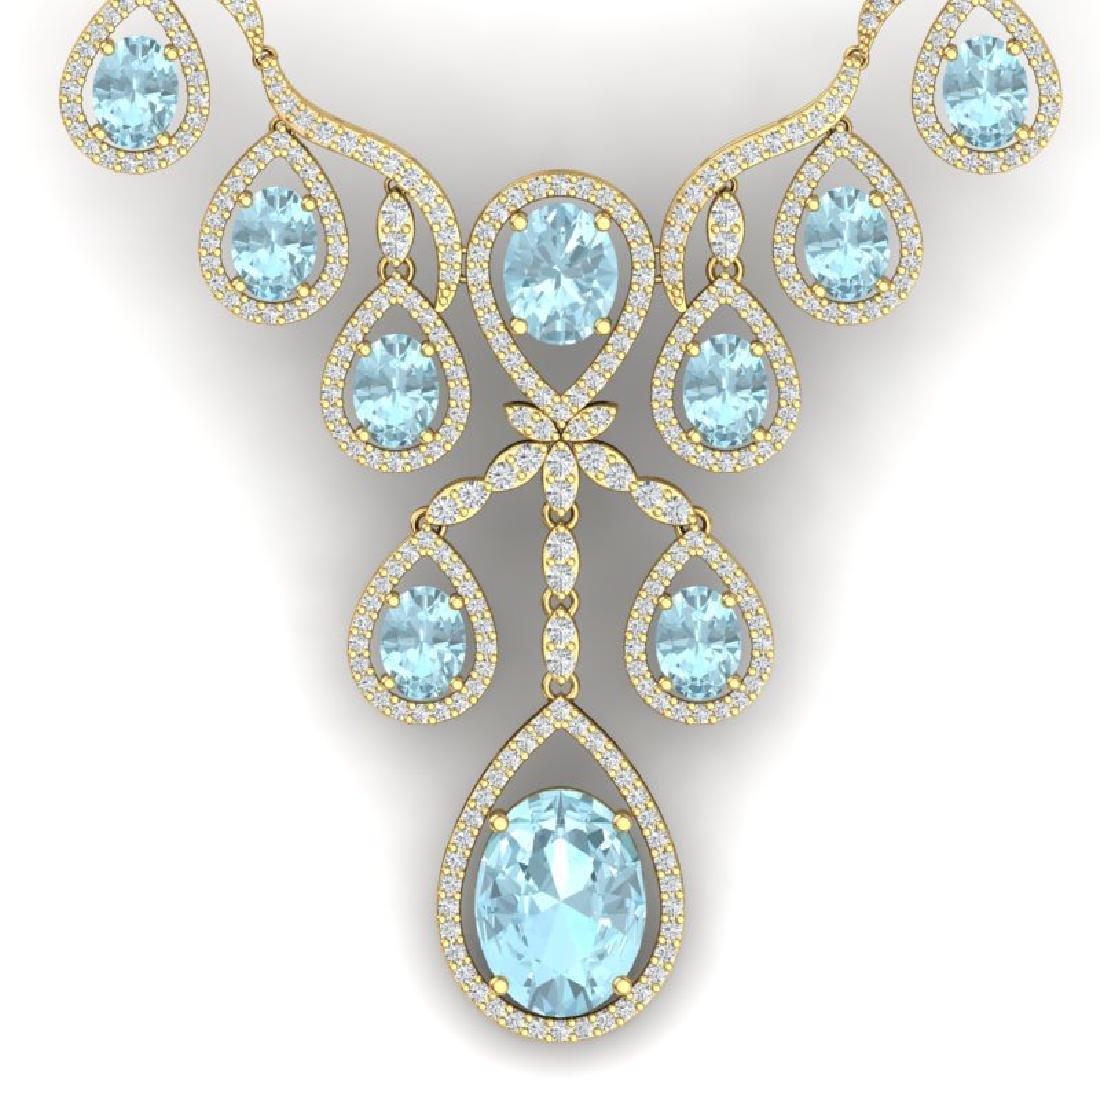 37.91 CTW Royalty Sky Topaz & VS Diamond Necklace 18K